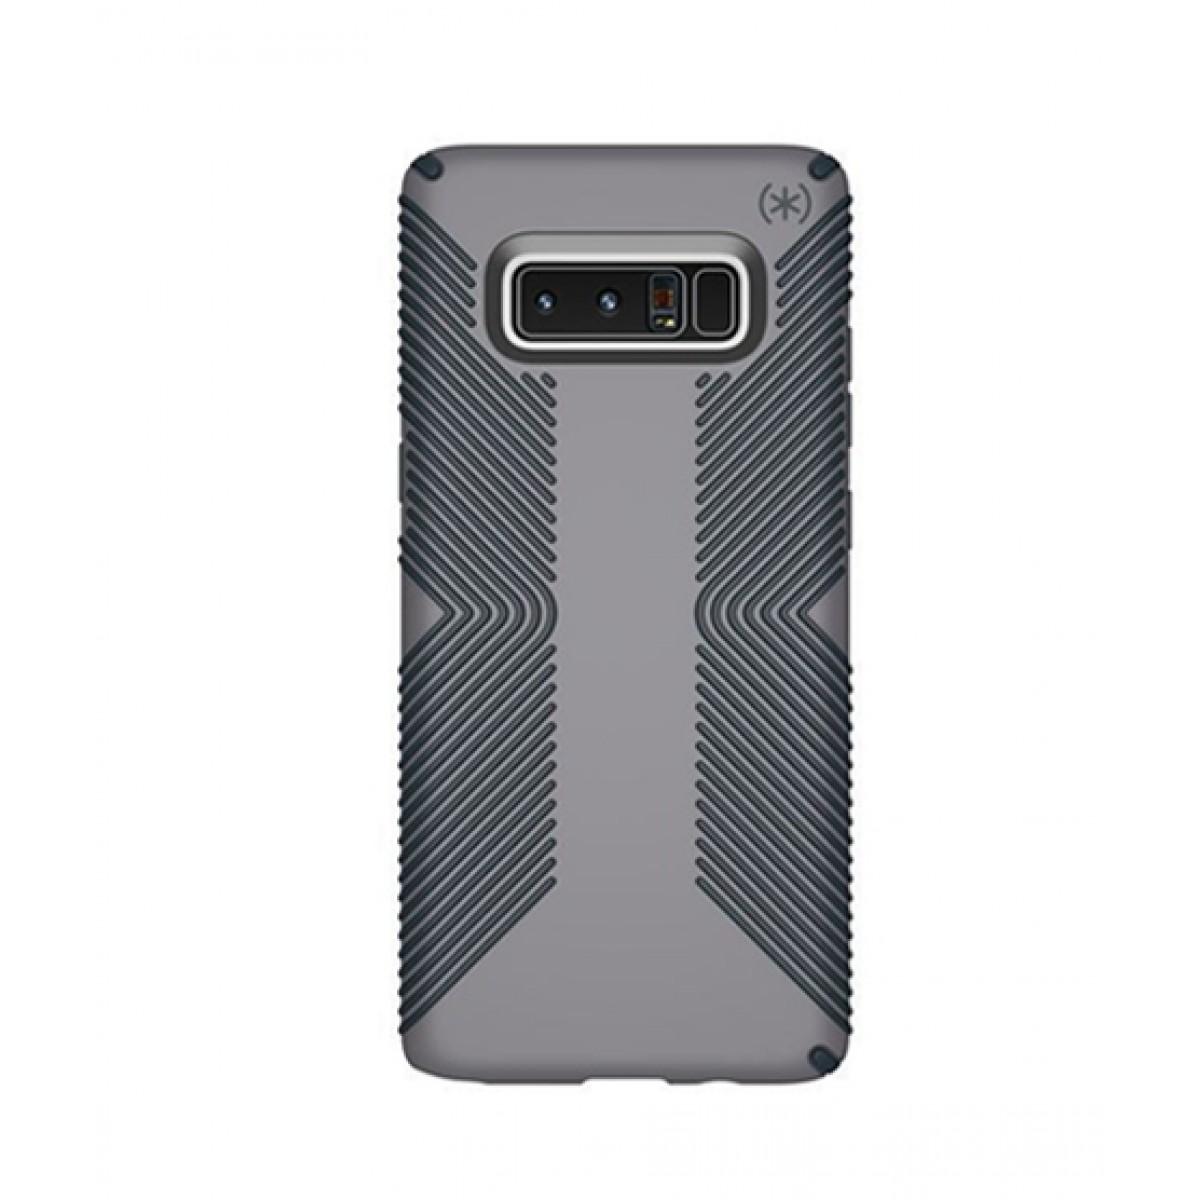 wholesale dealer d3771 4bedc Speck Presidio Grip Graphite/Charcoal Grey Case For Galaxy Note 8